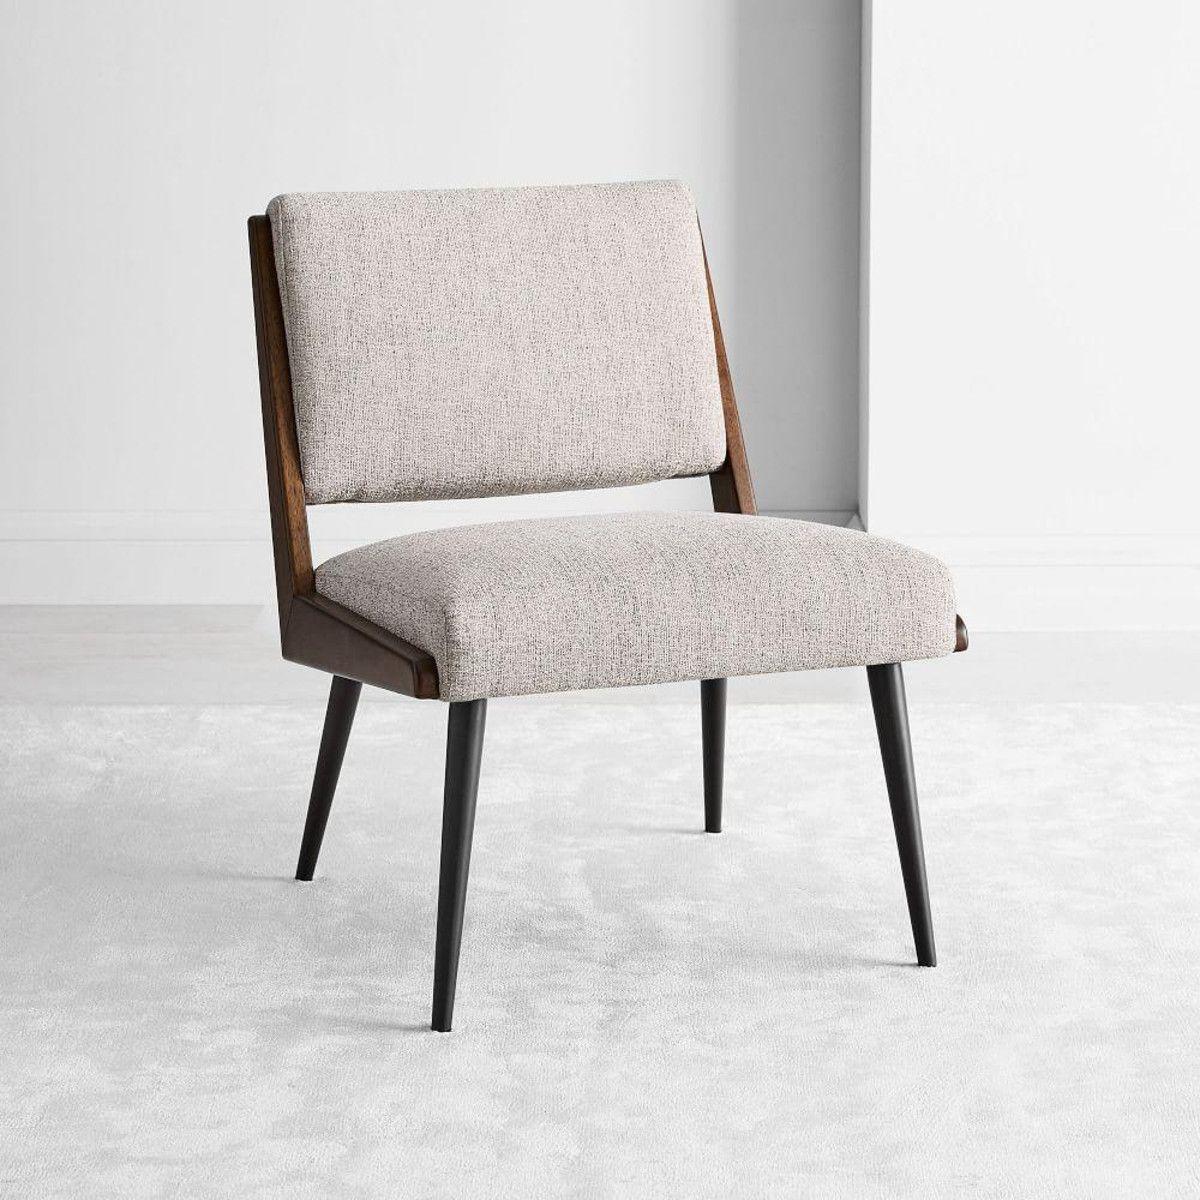 june SALE 339 Verona Slipper Chair west elm Canada